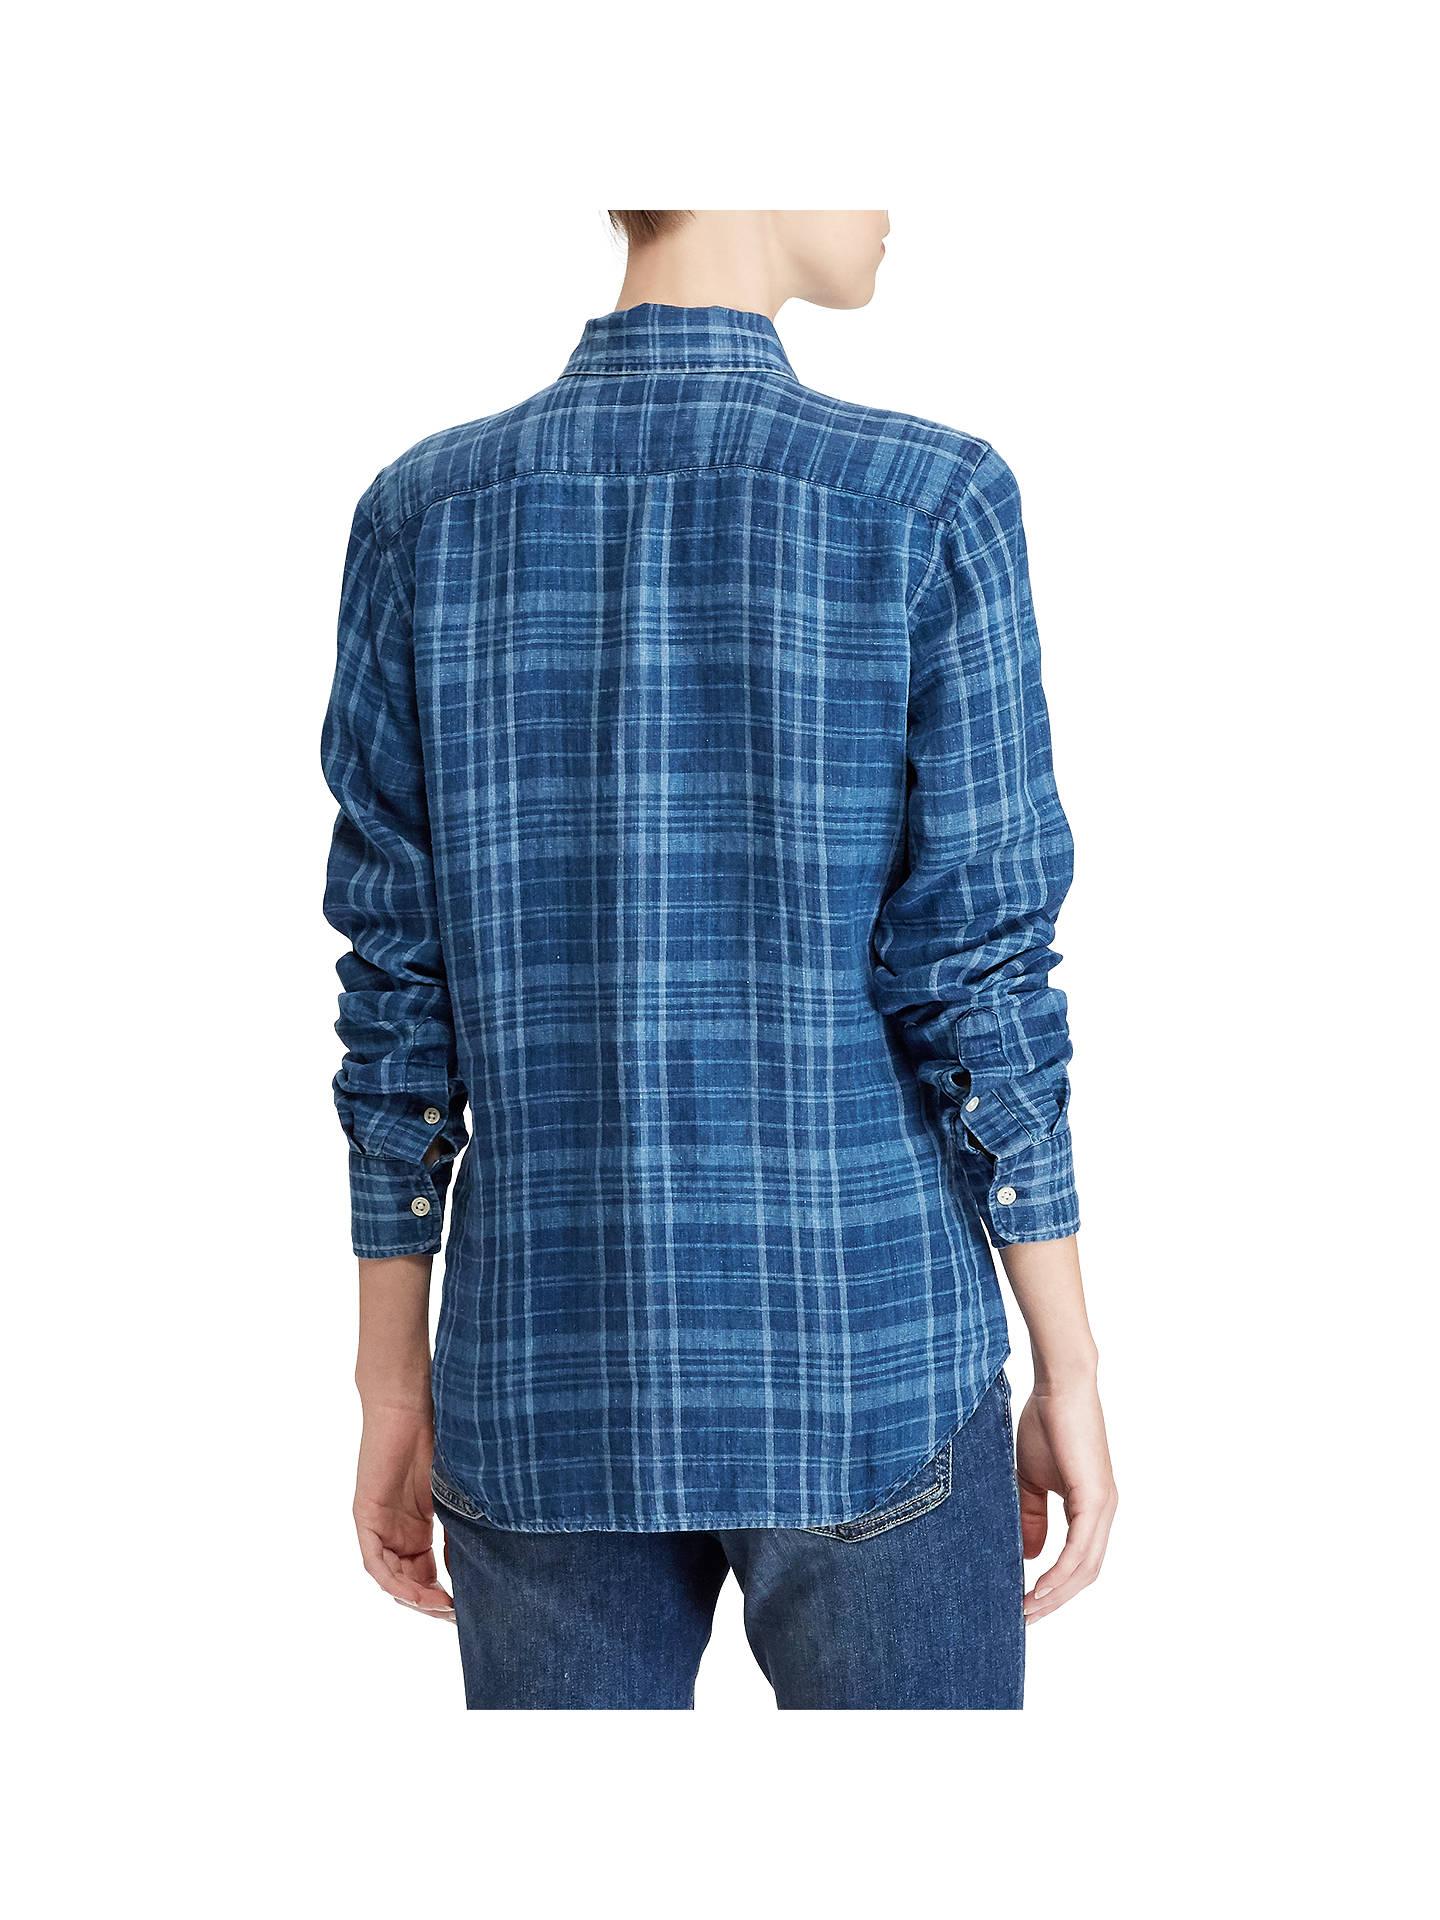 e381adca Polo Ralph Lauren Classic Fit Plaid Linen Shirt, Blue Plaid at John ...